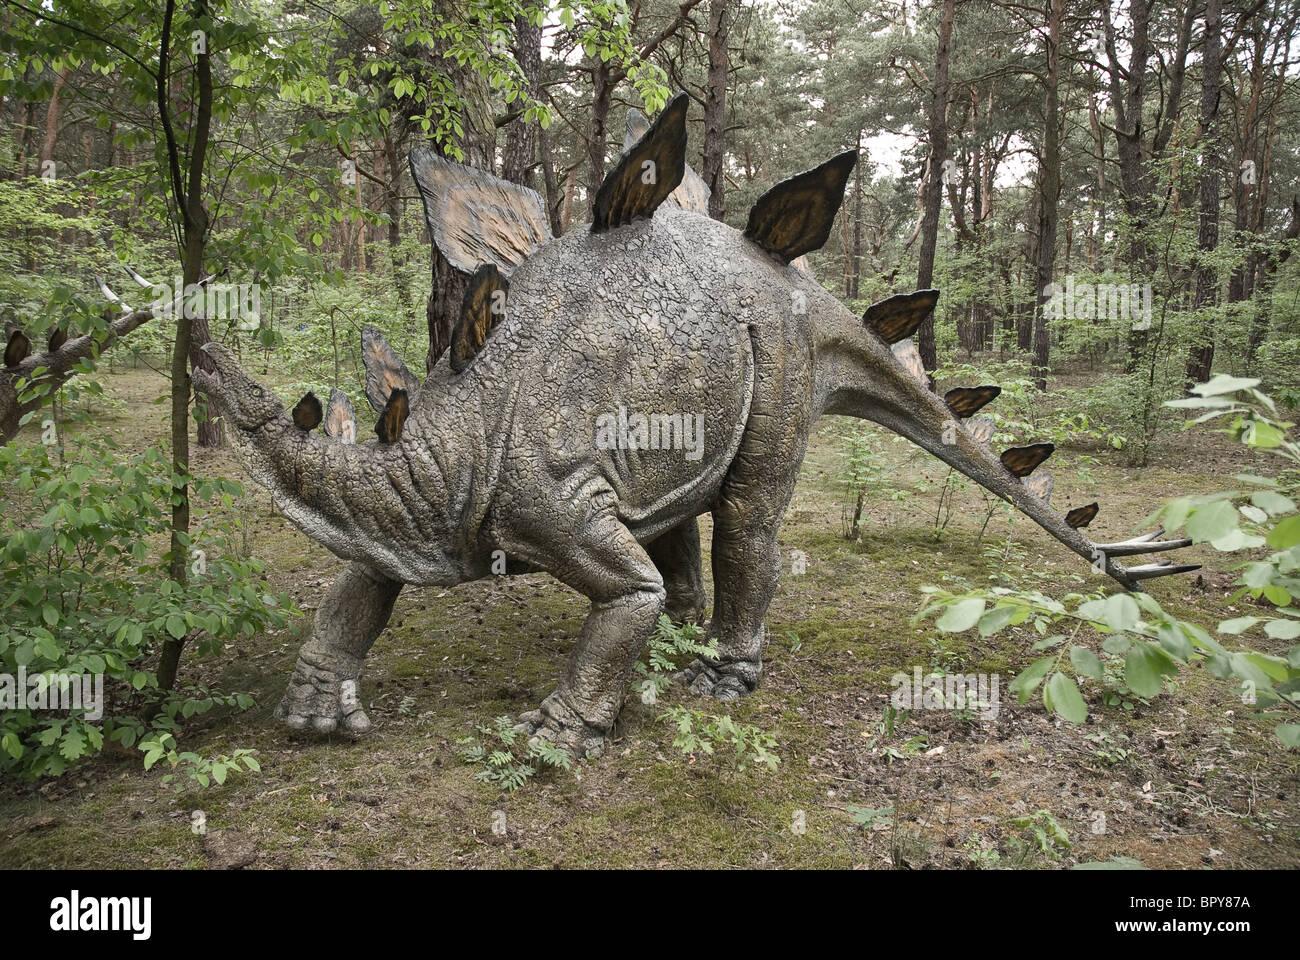 Dinosaur - Stegosaurus - Stock Image